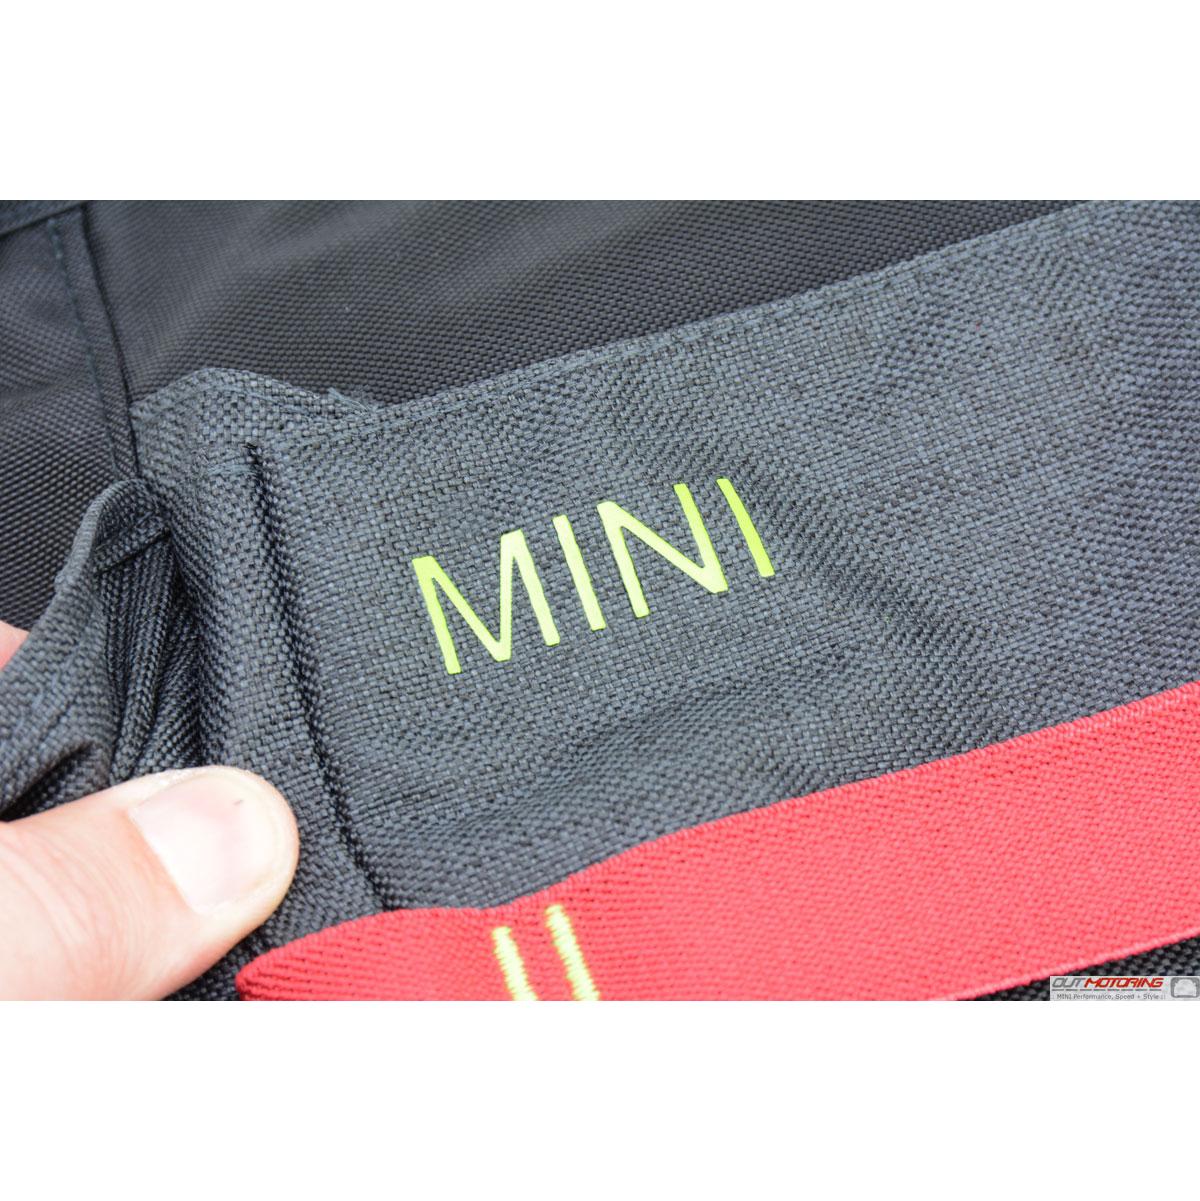 51912240319 MINI Cooper Trunk Ledge Protection Film